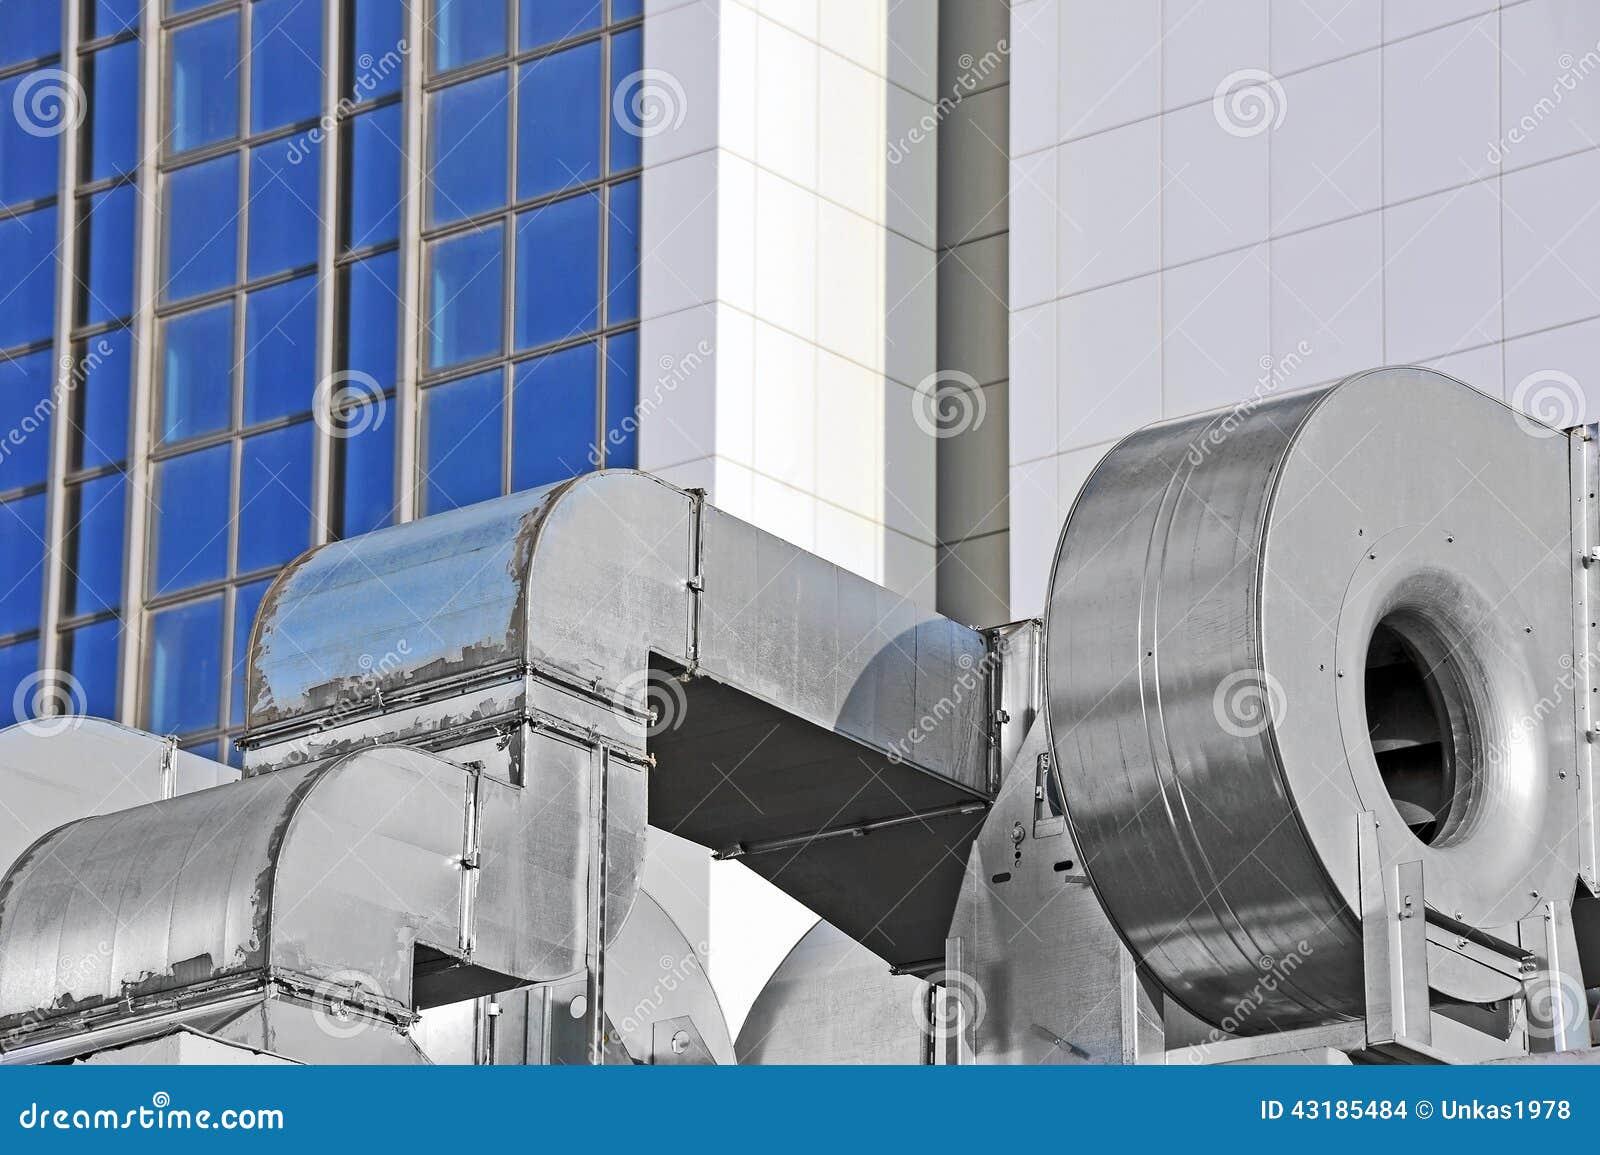 Industrial Air Ventilator : Industrial ventilation system stock photo image